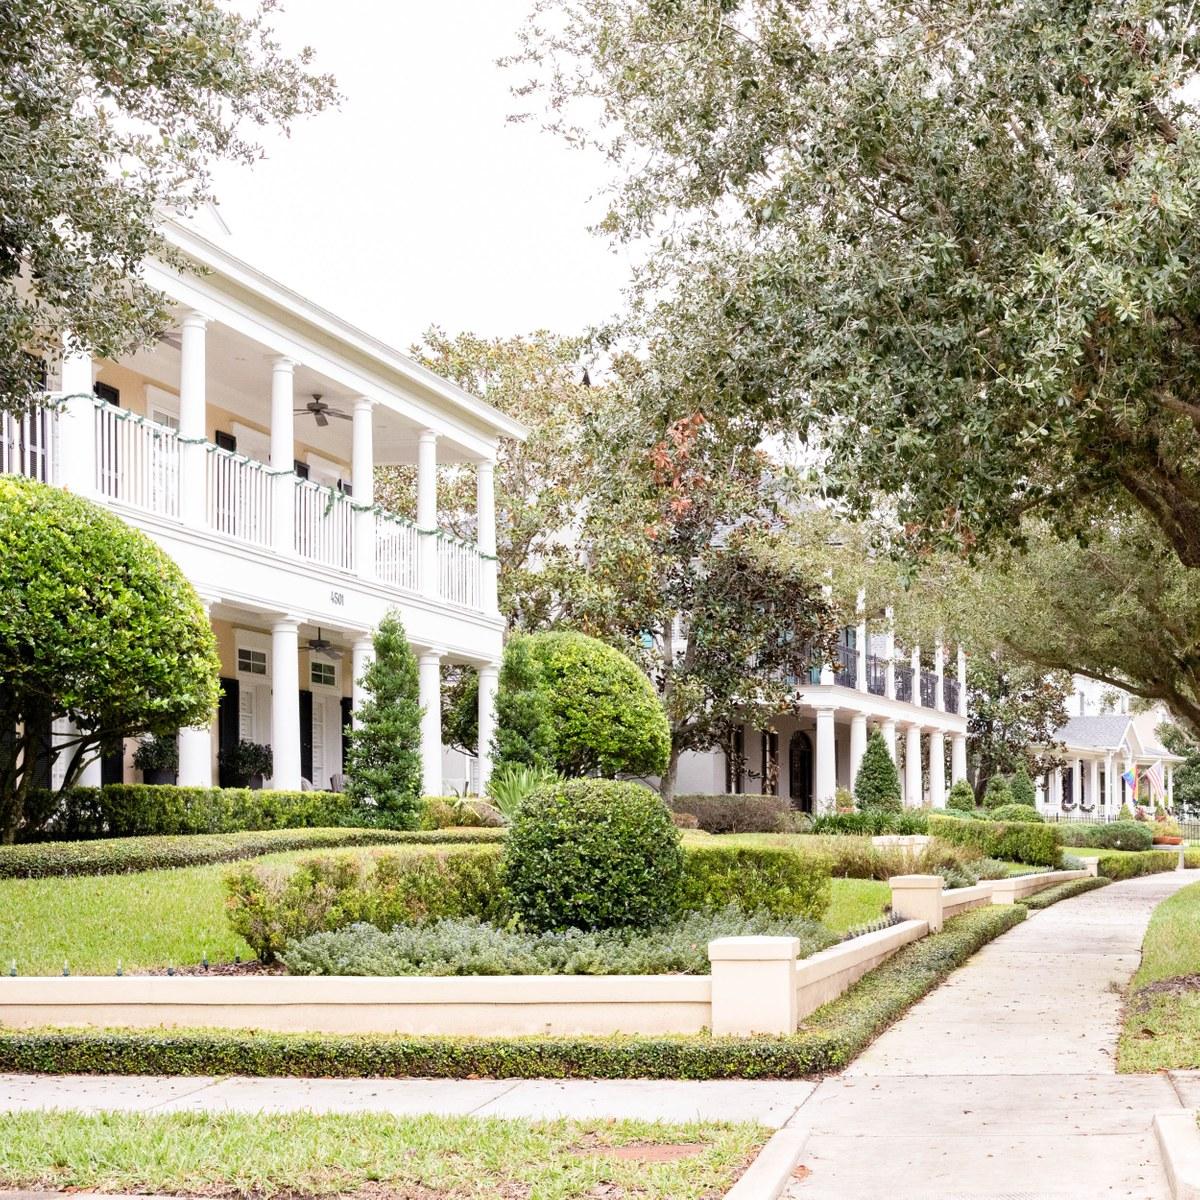 Hookup New Baldwin Park: Baldwin Park, Orlando FL - Neighborhood Guide